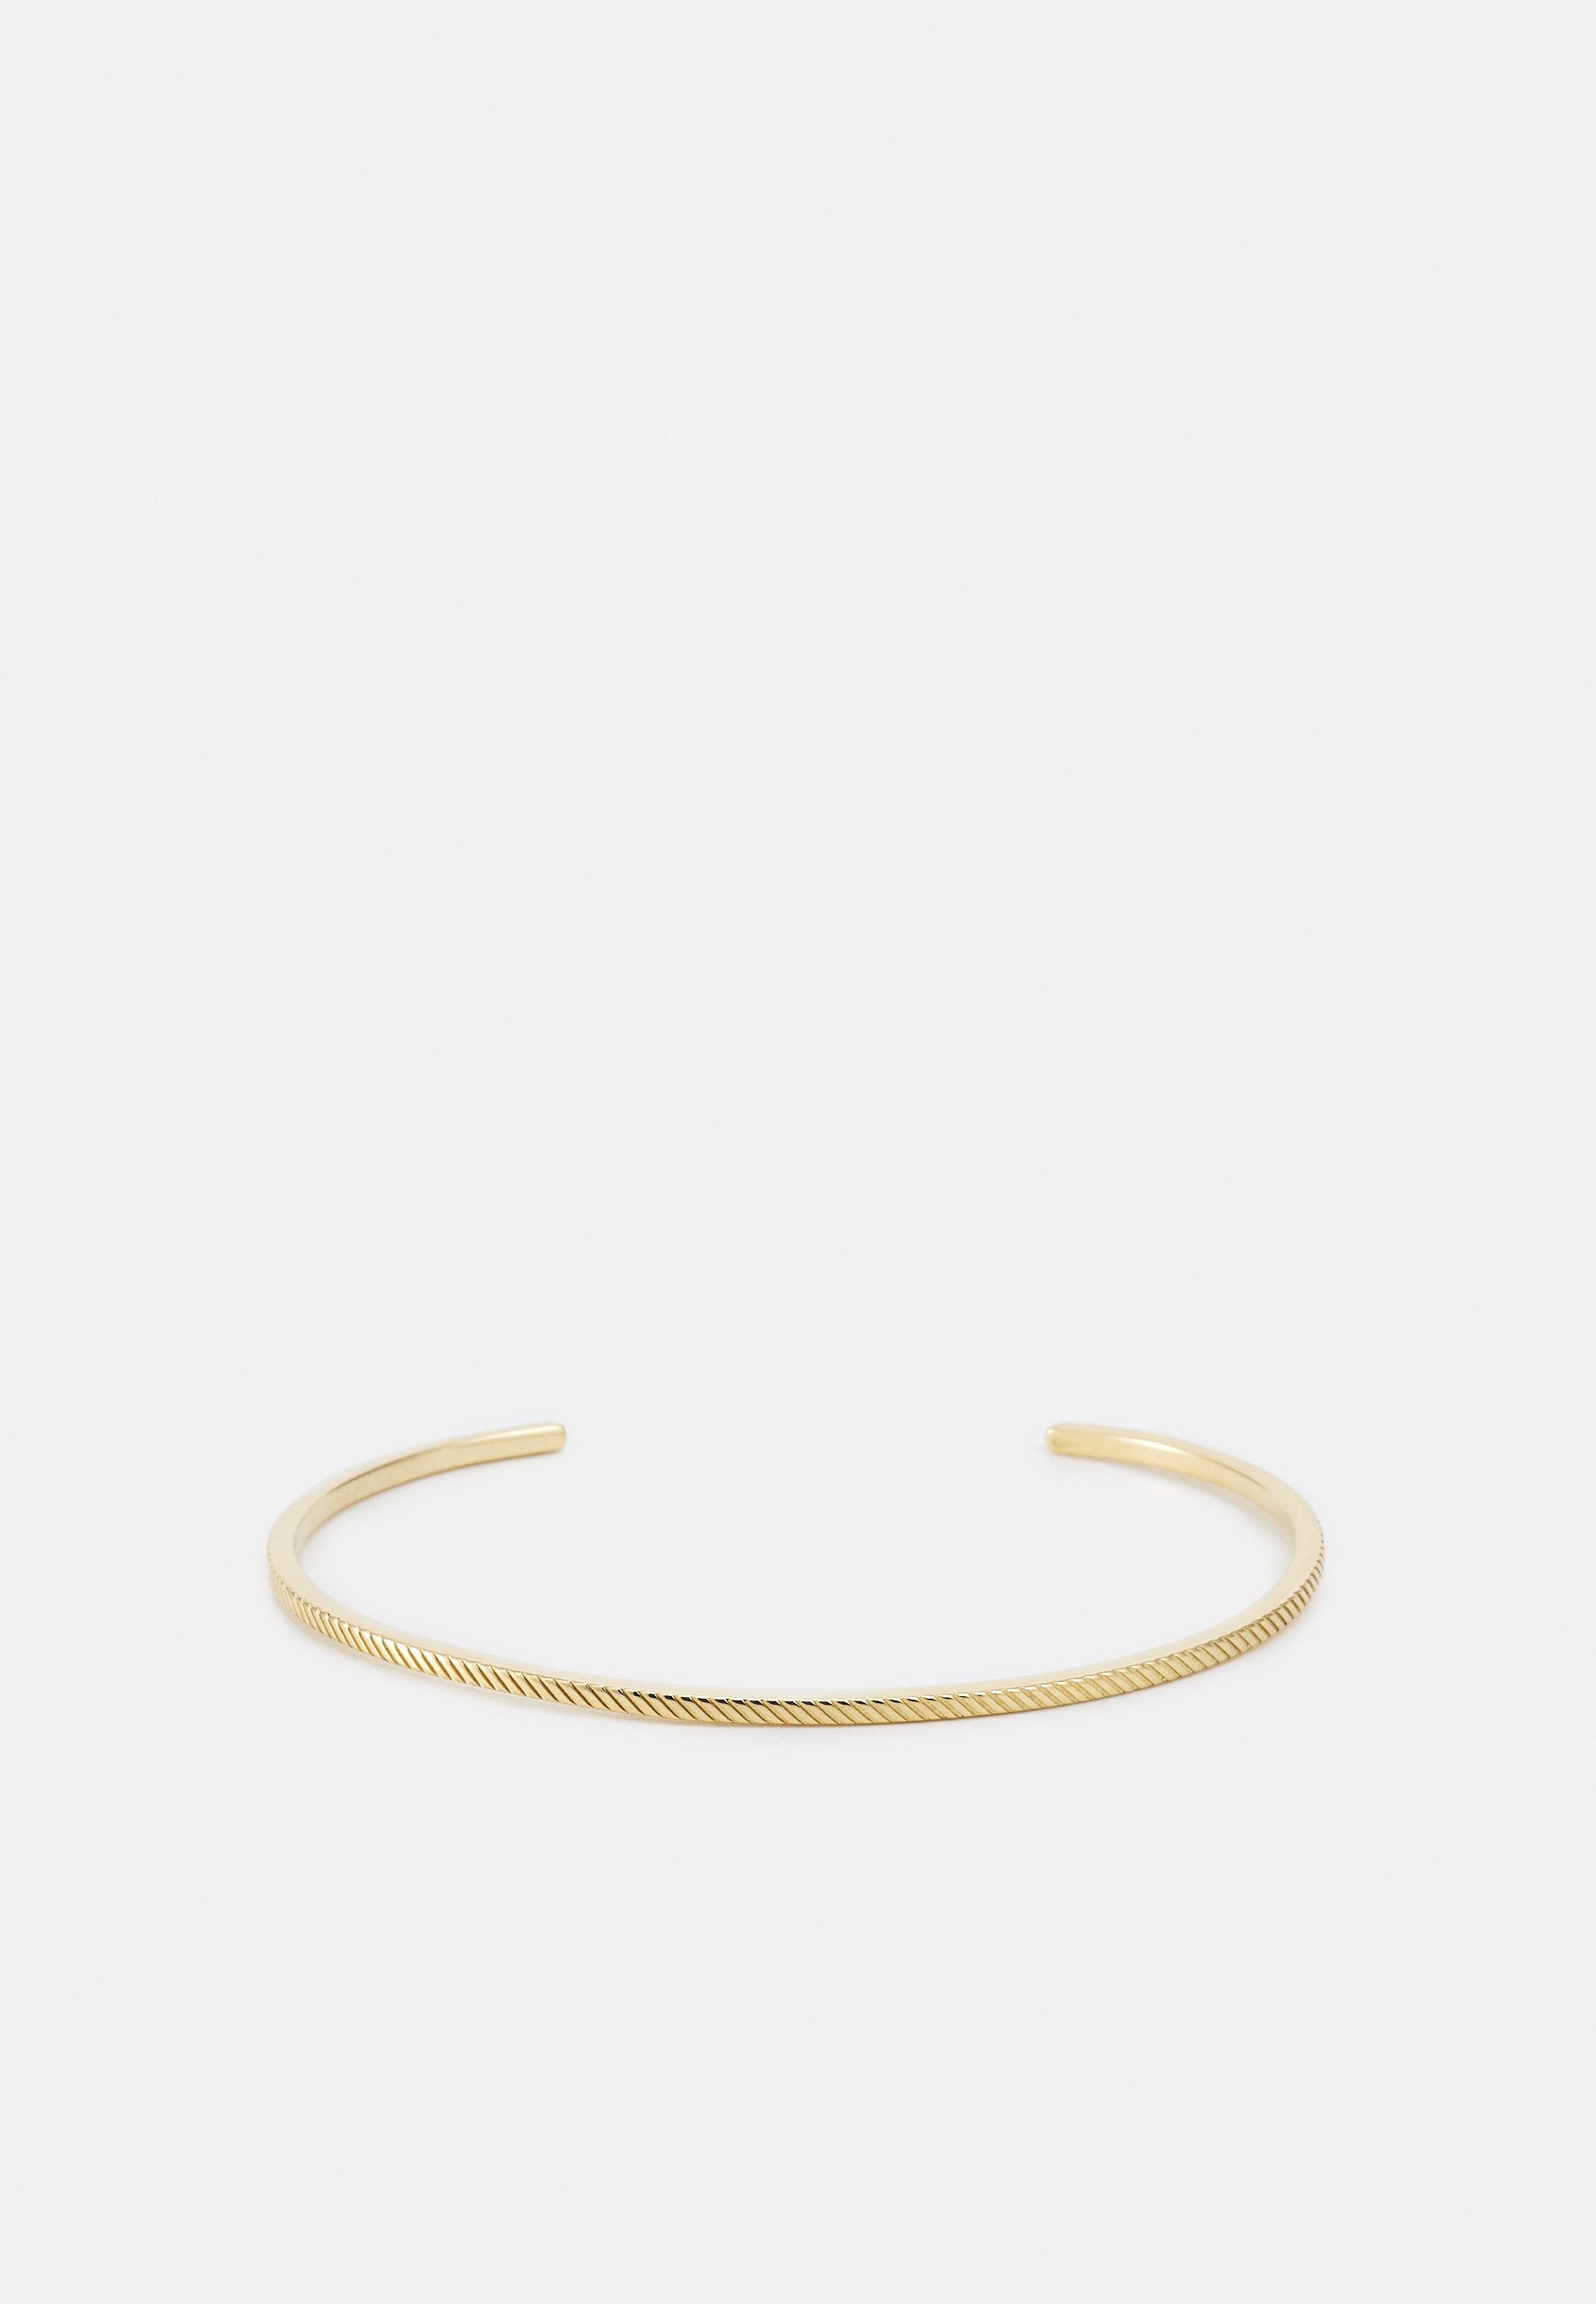 Homme VENICE CUFF UNISEX - Bracelet